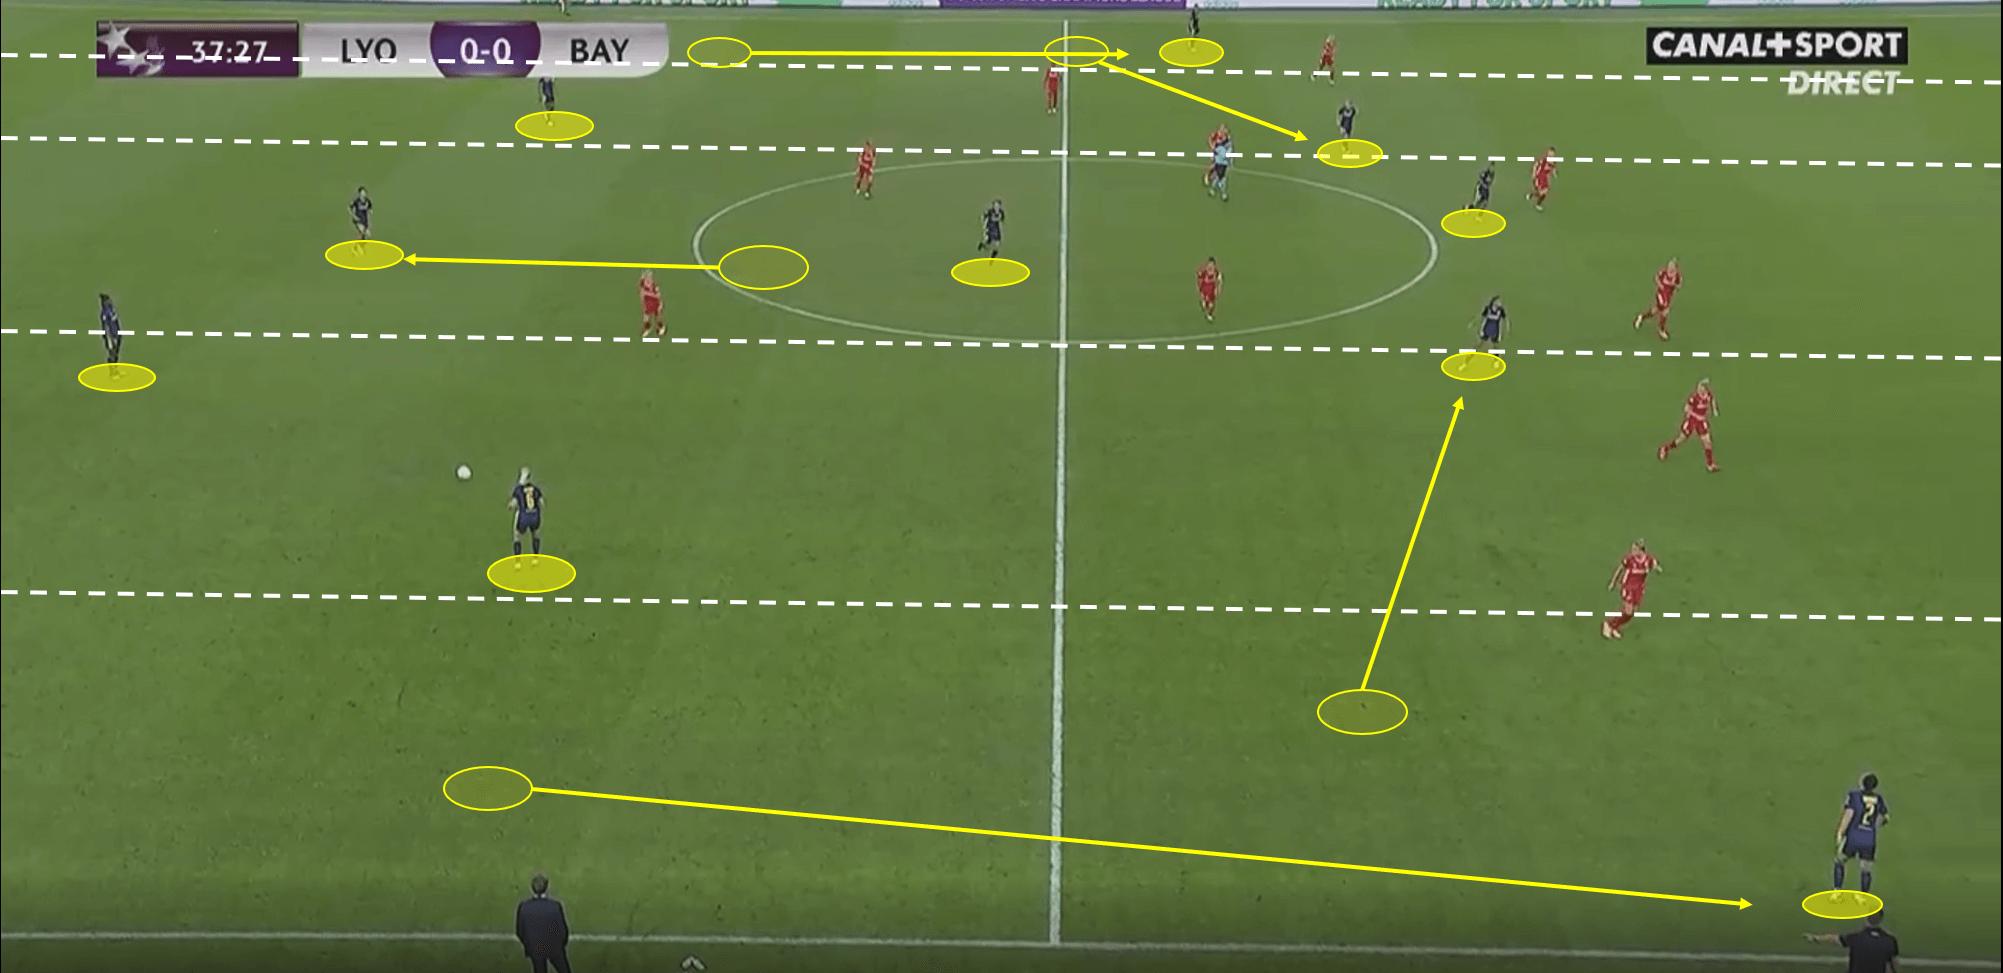 UEFA Women's Champions League 2019/20: Olympique Lyon Feminin vs Bayern Munich – tactical analysis tactics